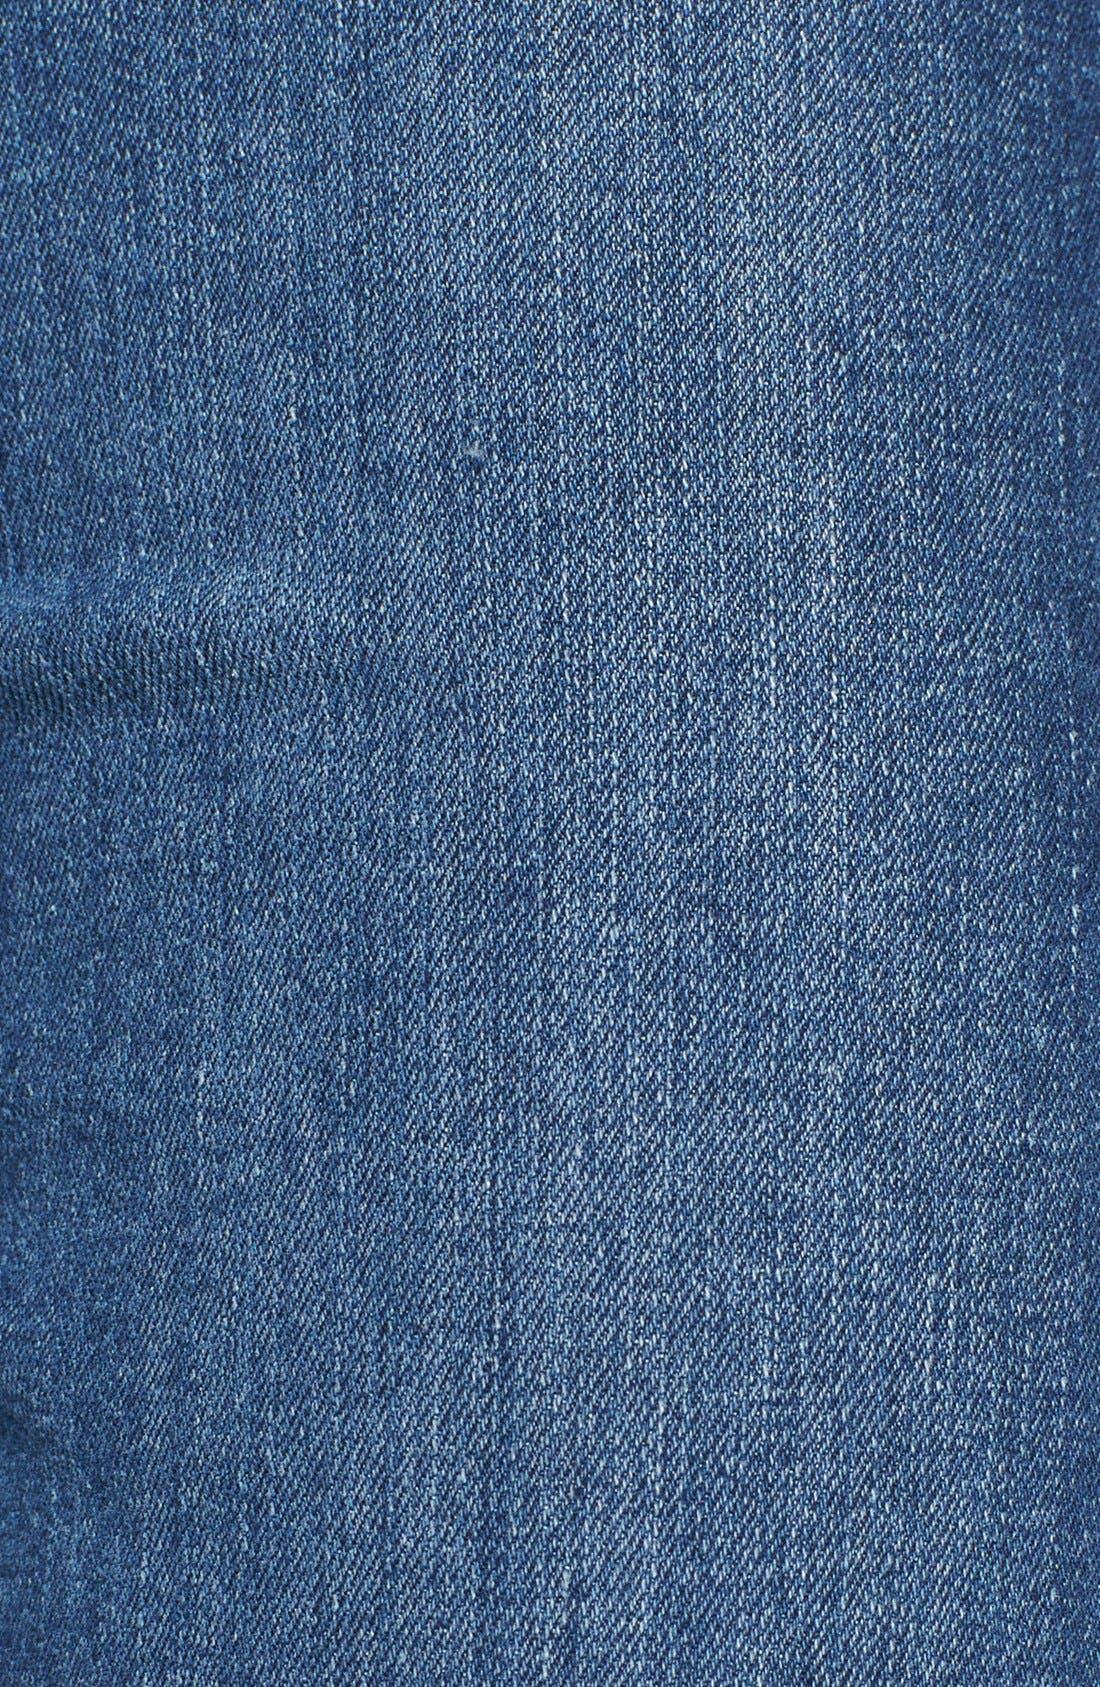 'Le High Flare' Jeans,                             Alternate thumbnail 15, color,